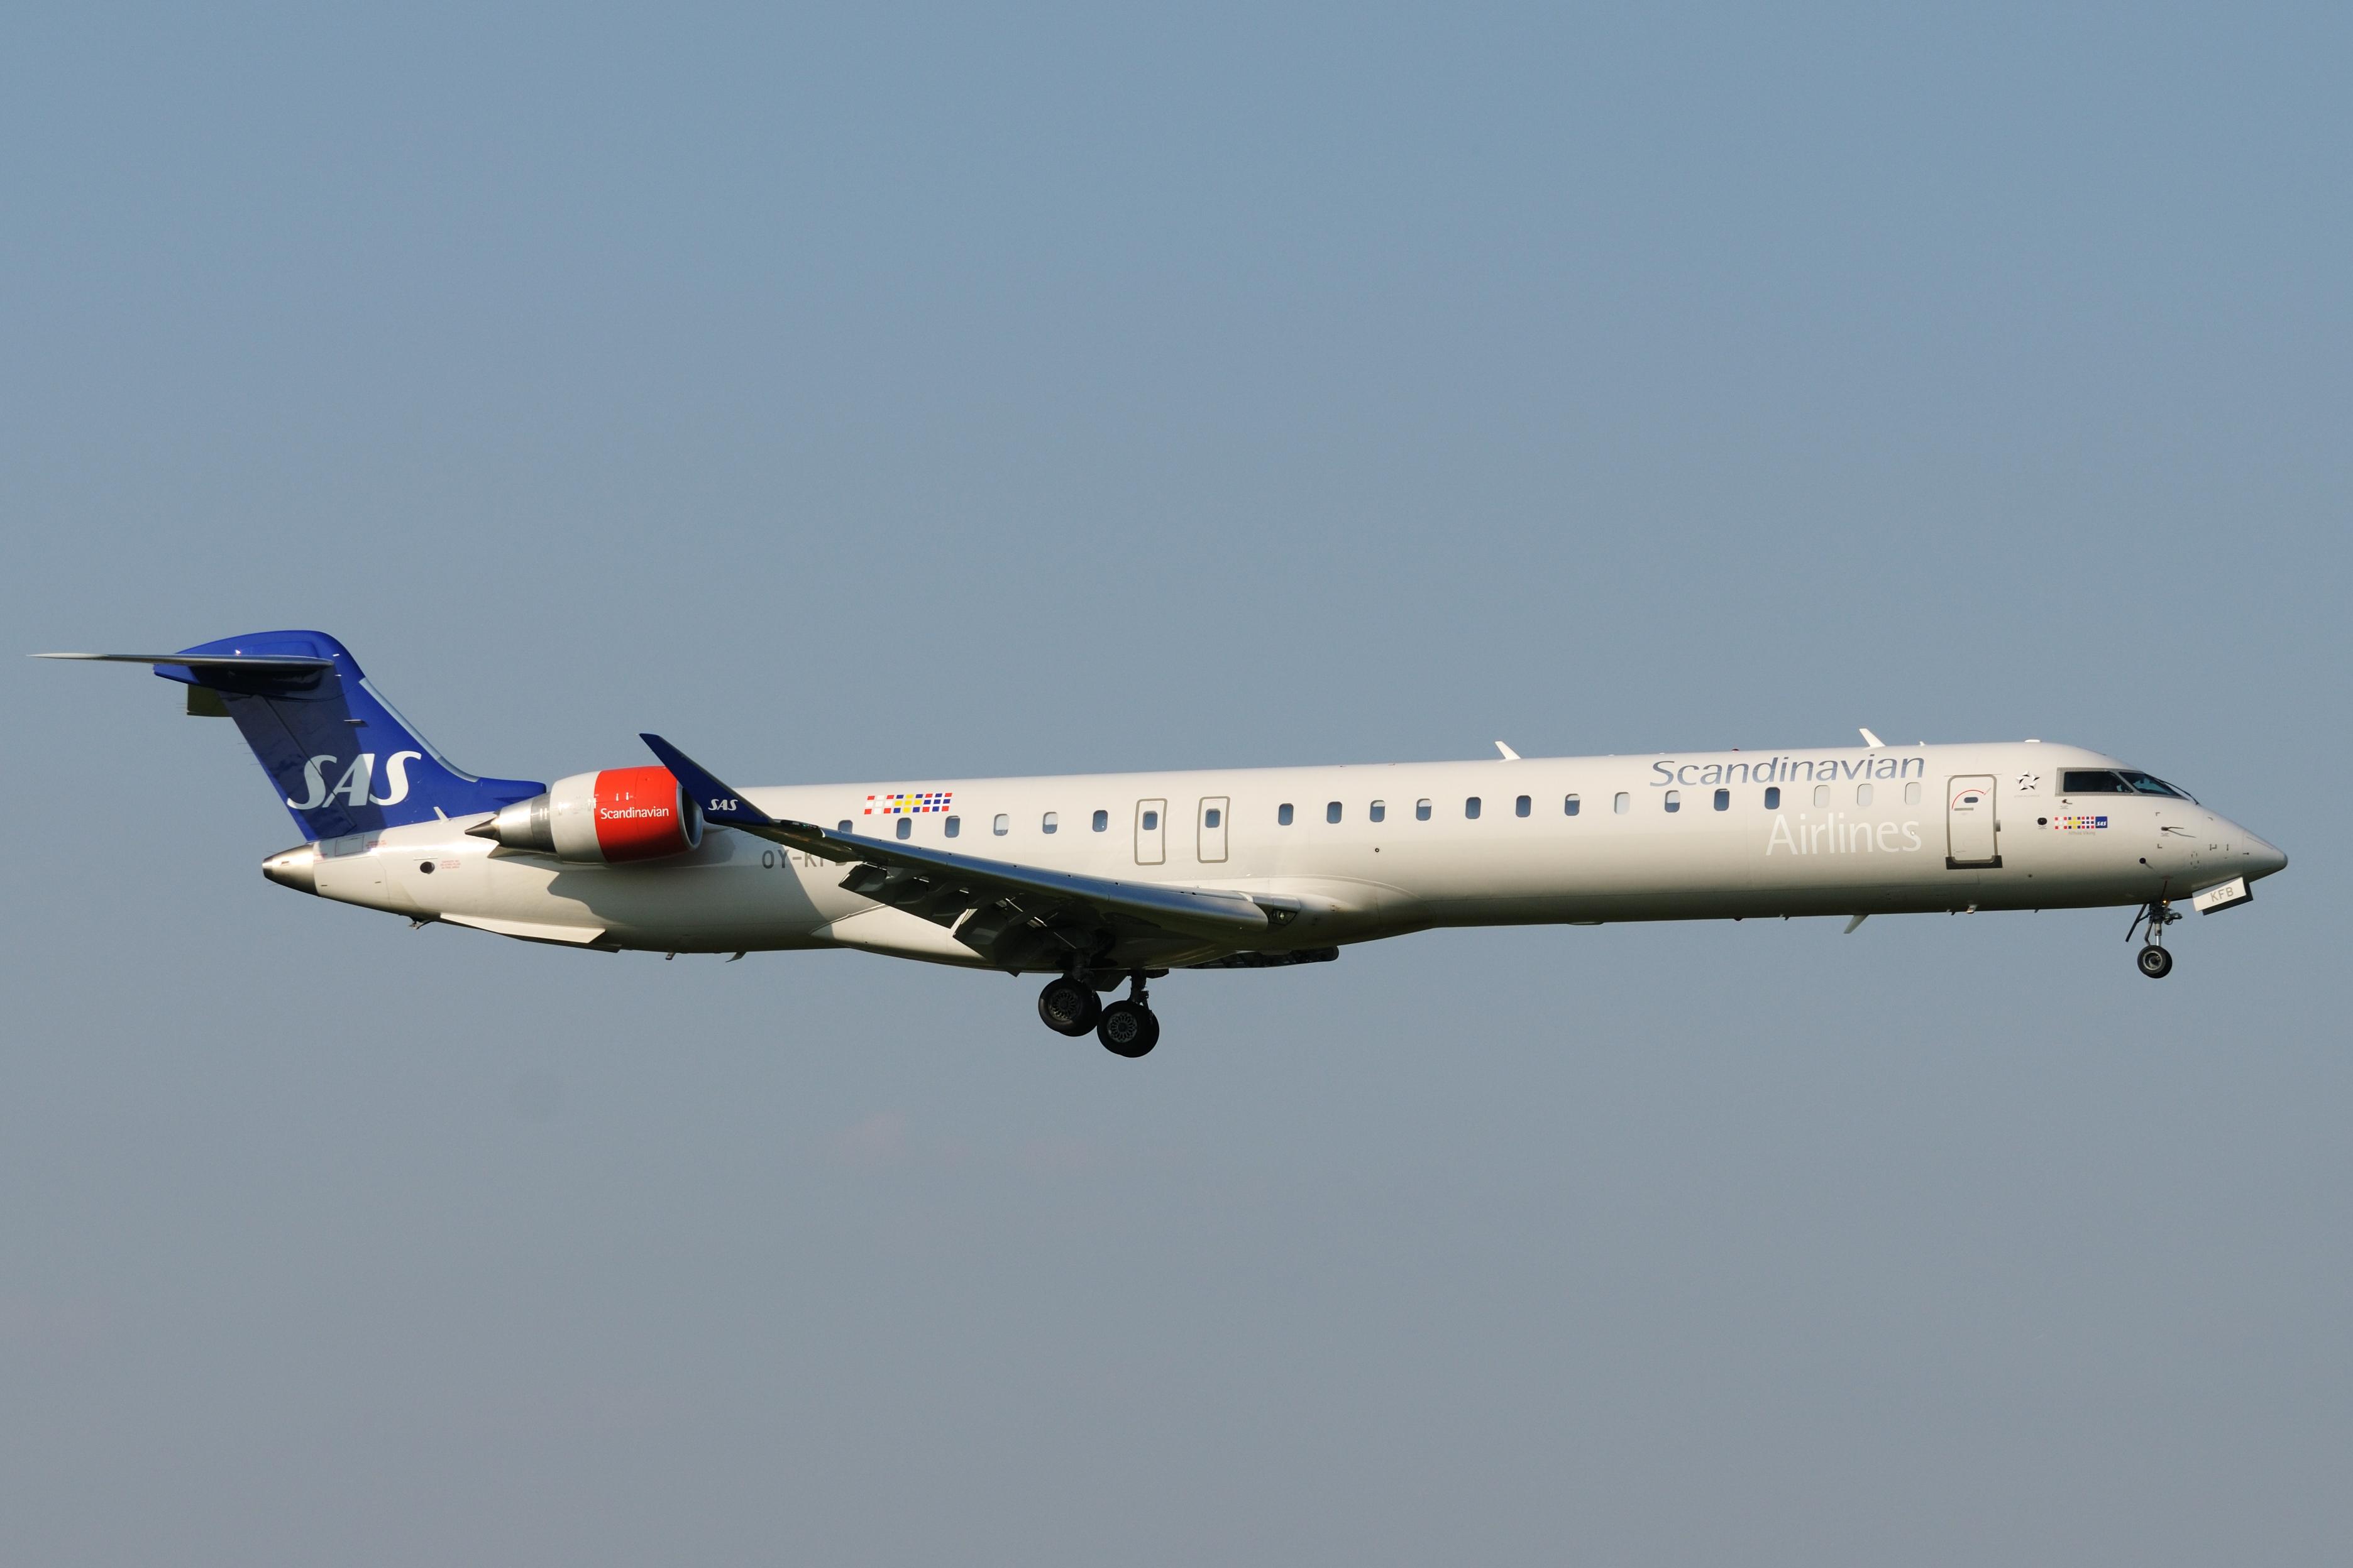 file bombardier crj 900 oy kfb sas scandinavian airlines system rh commons wikimedia org crj 900 systems study guide Delta CRJ-900